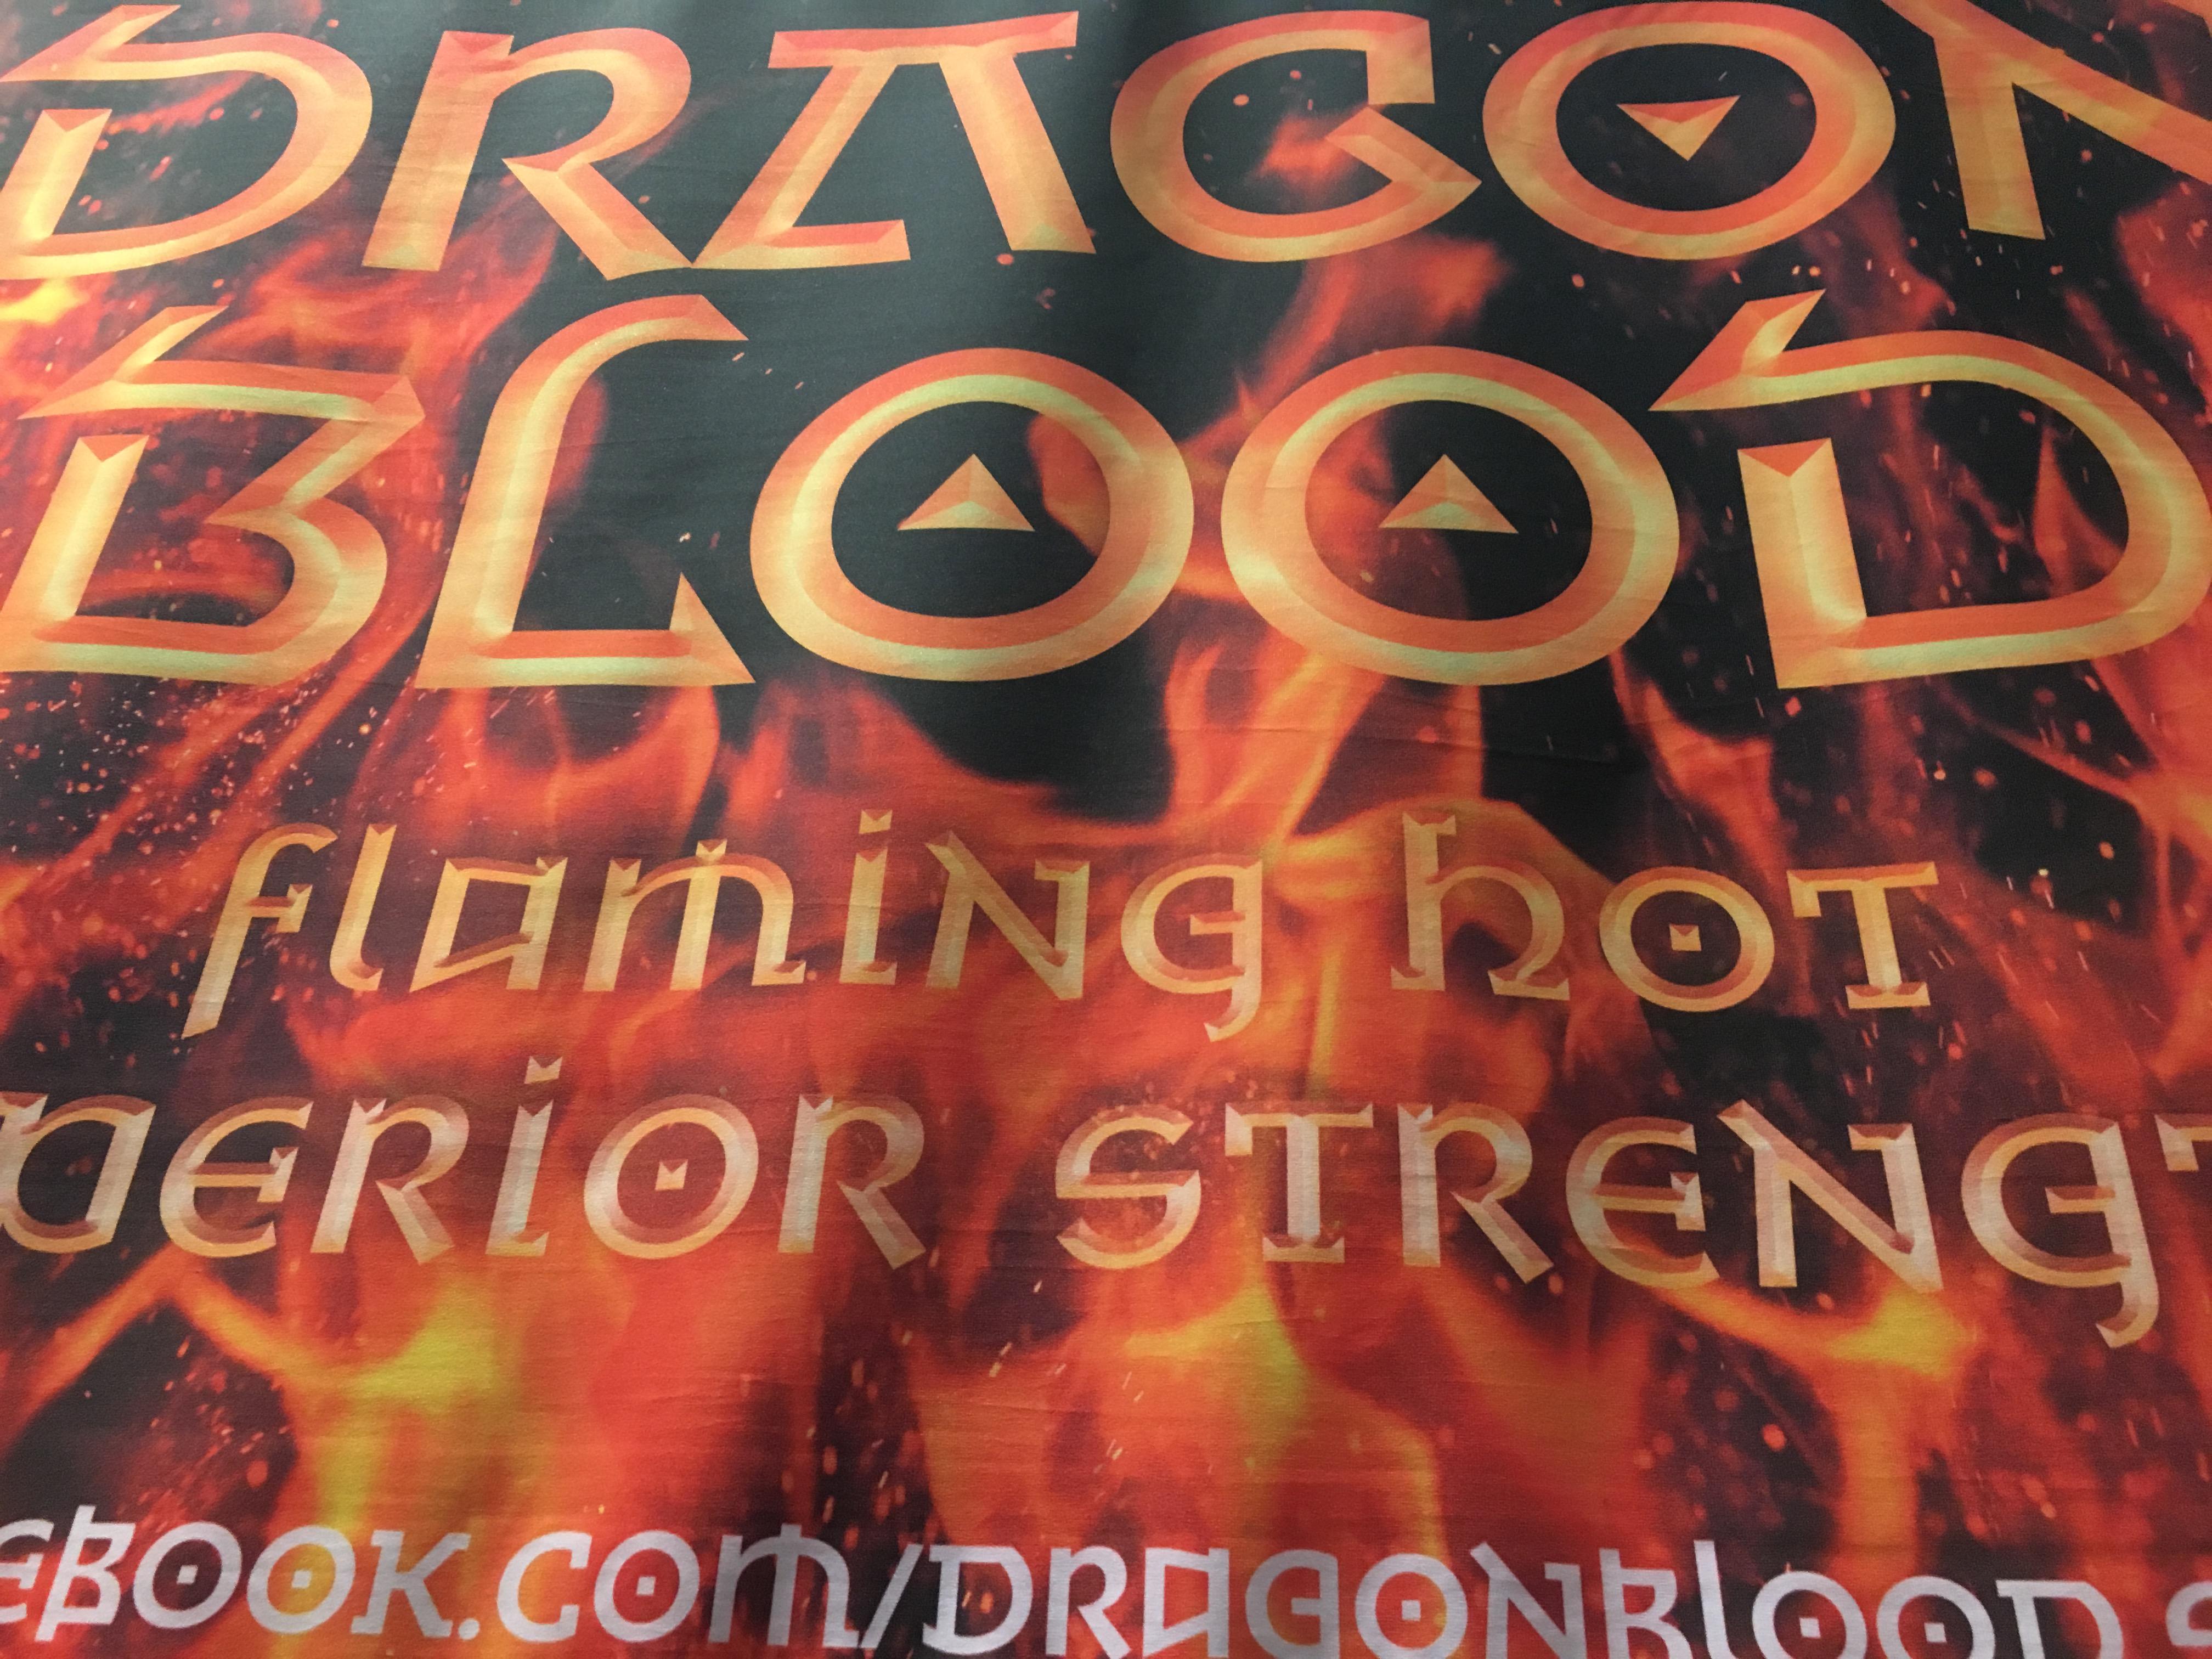 Dragon Blood exhibition success